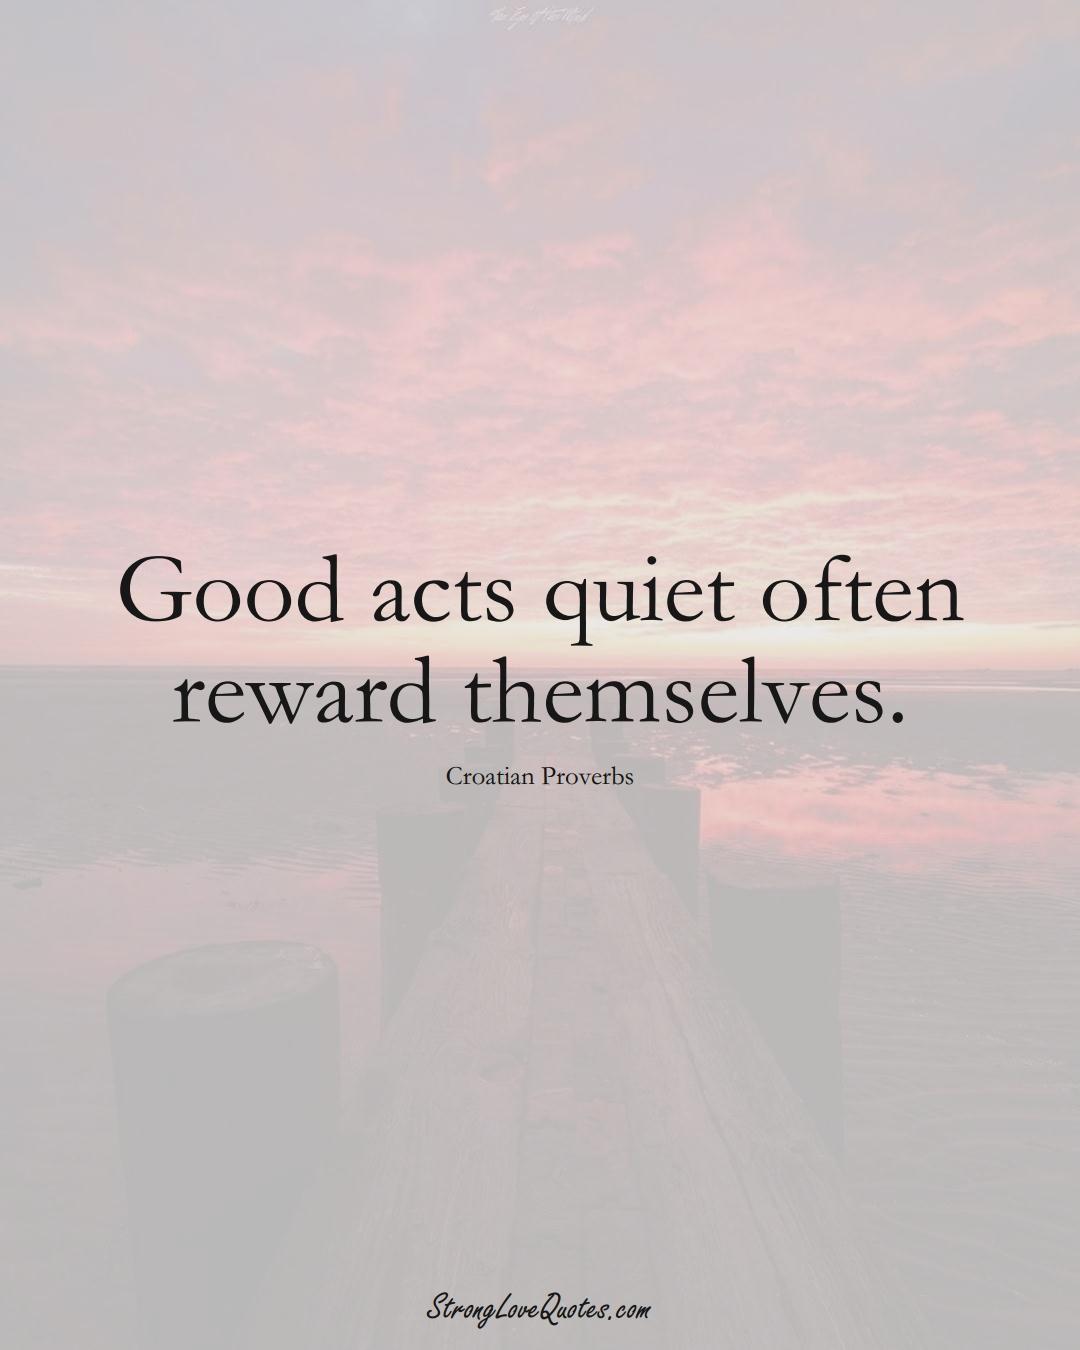 Good acts quiet often reward themselves. (Croatian Sayings);  #EuropeanSayings